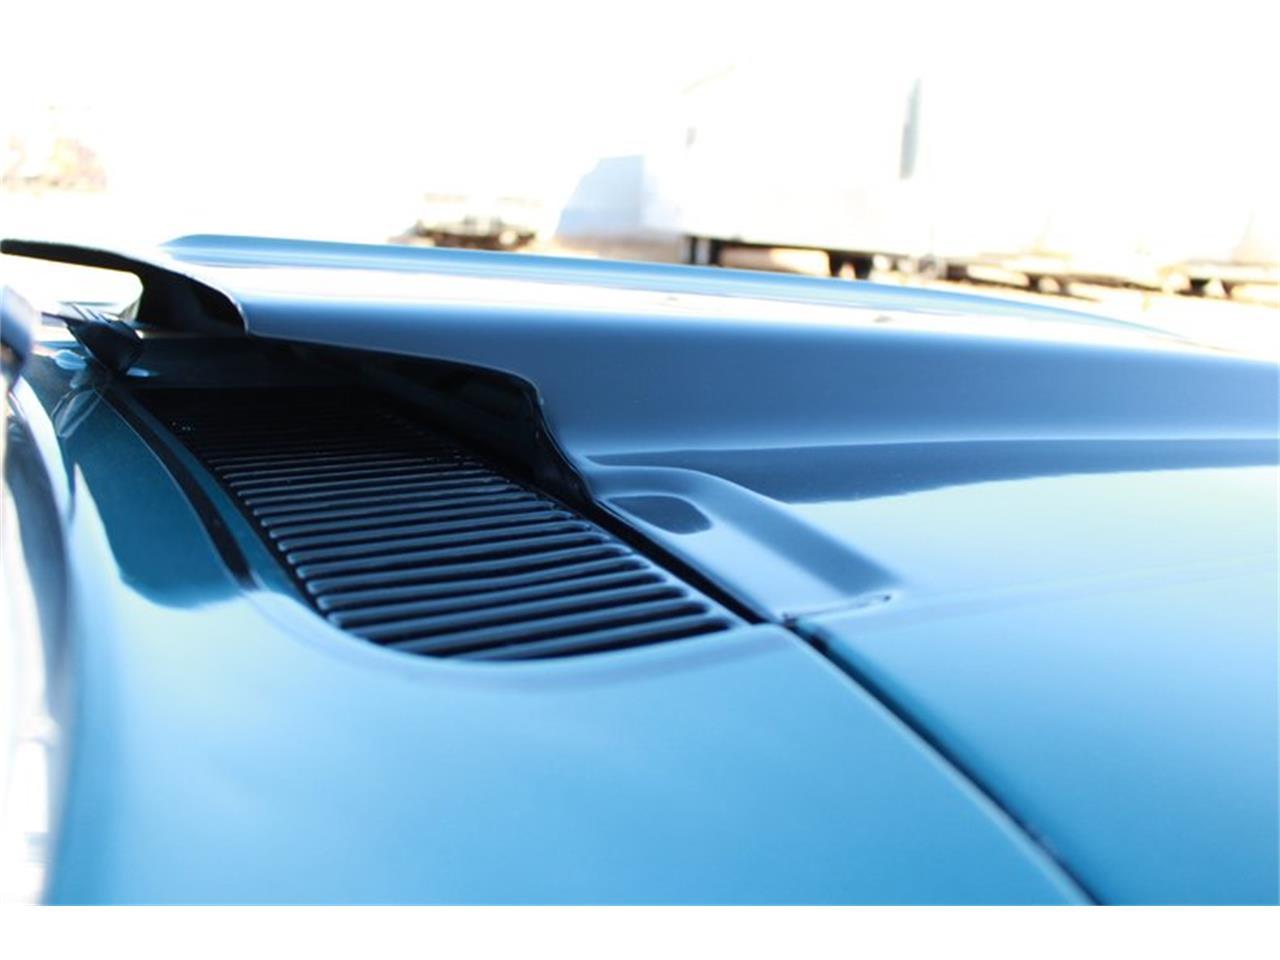 Large Picture of '69 Chevrolet Camaro located in Vernal Utah - LEAX